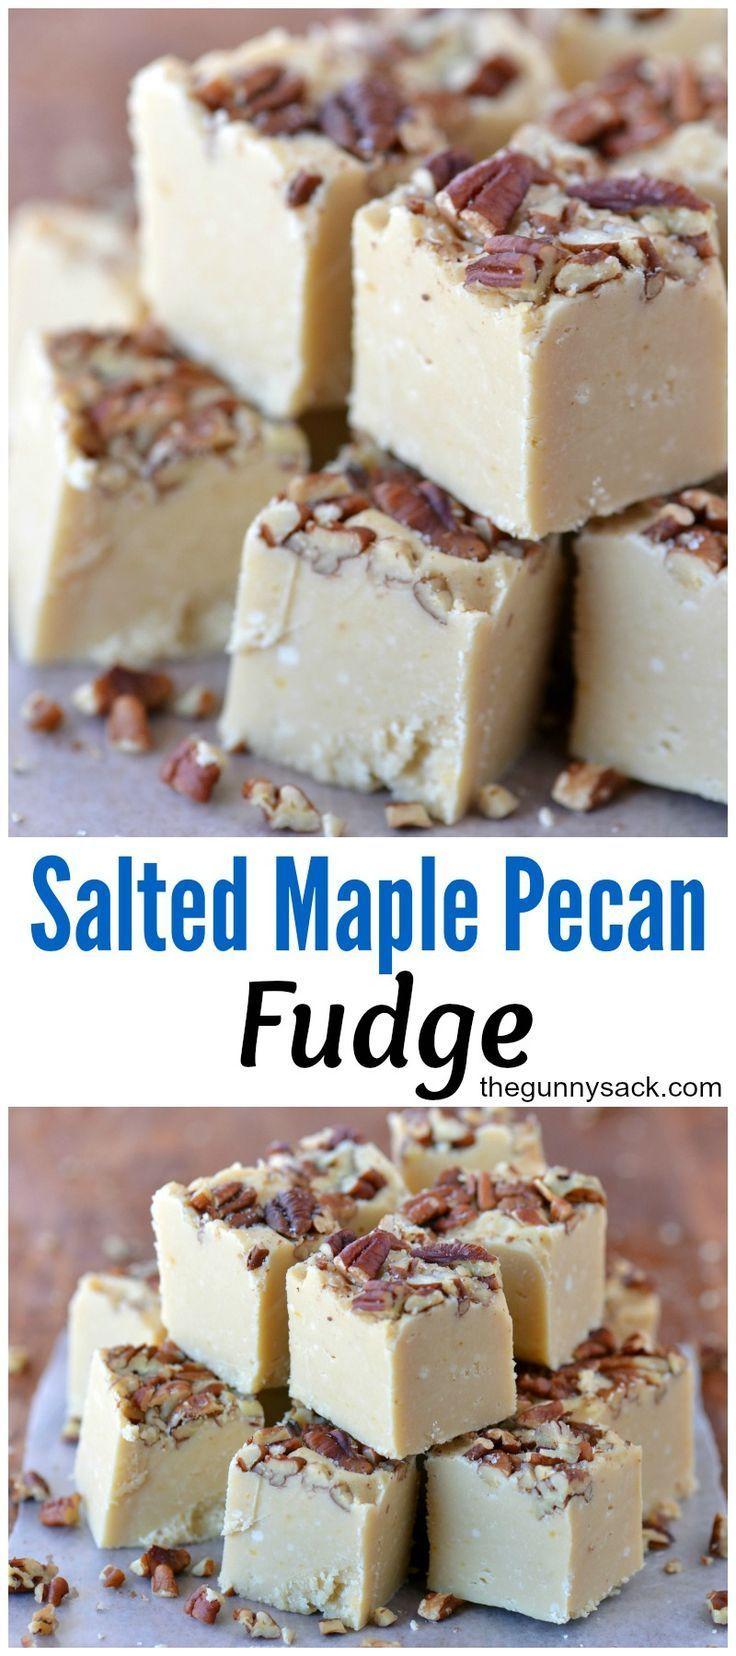 Salted Maple Pecan Fudge - The Gunny Sack